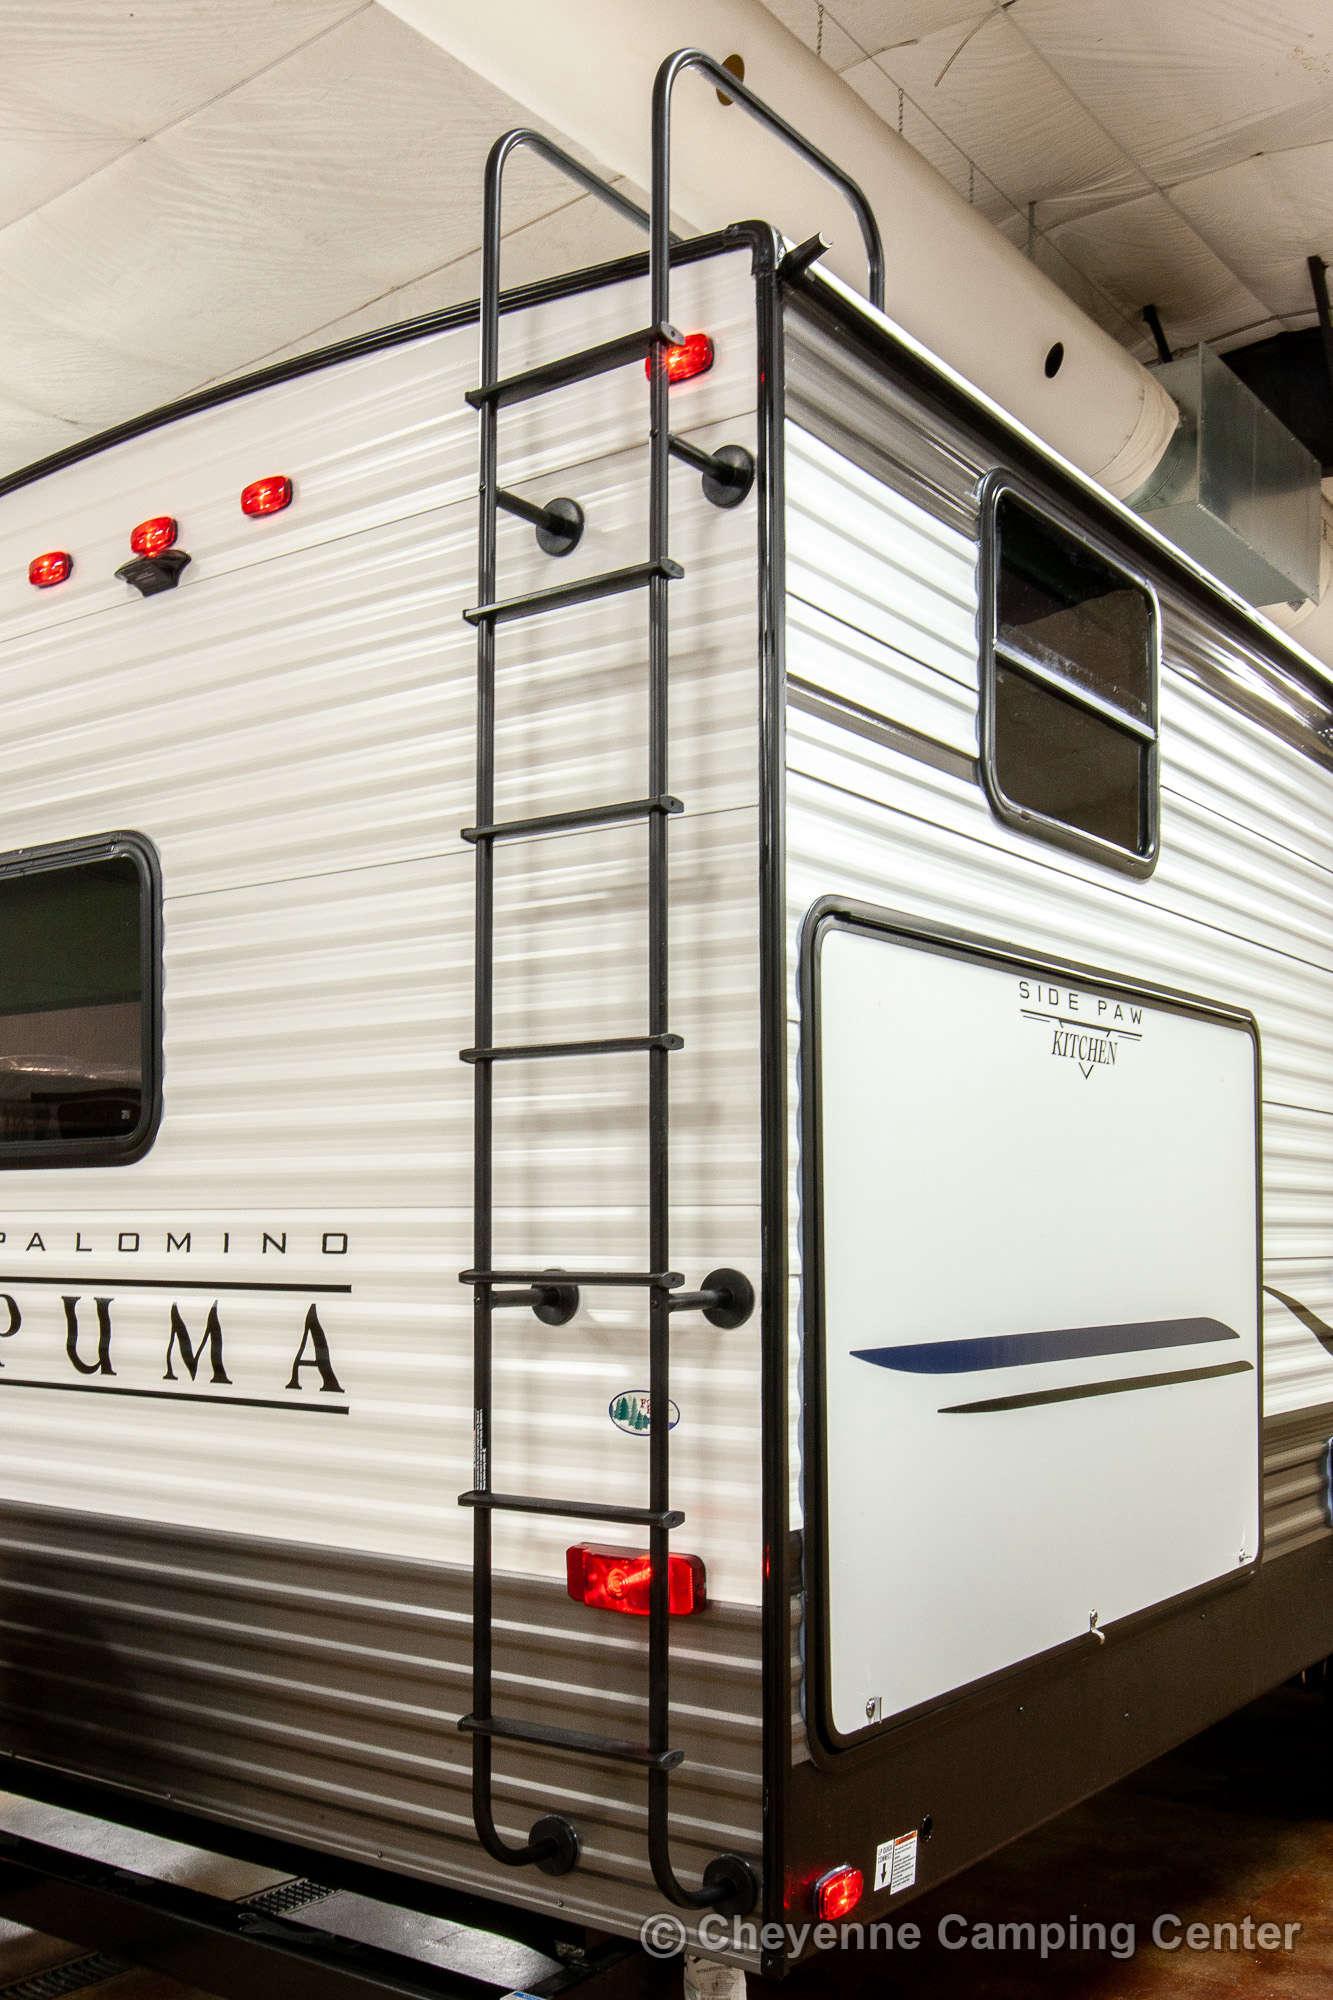 2021 Palomino Puma 31QBBH Bunkhouse Travel Trailer Exterior Image